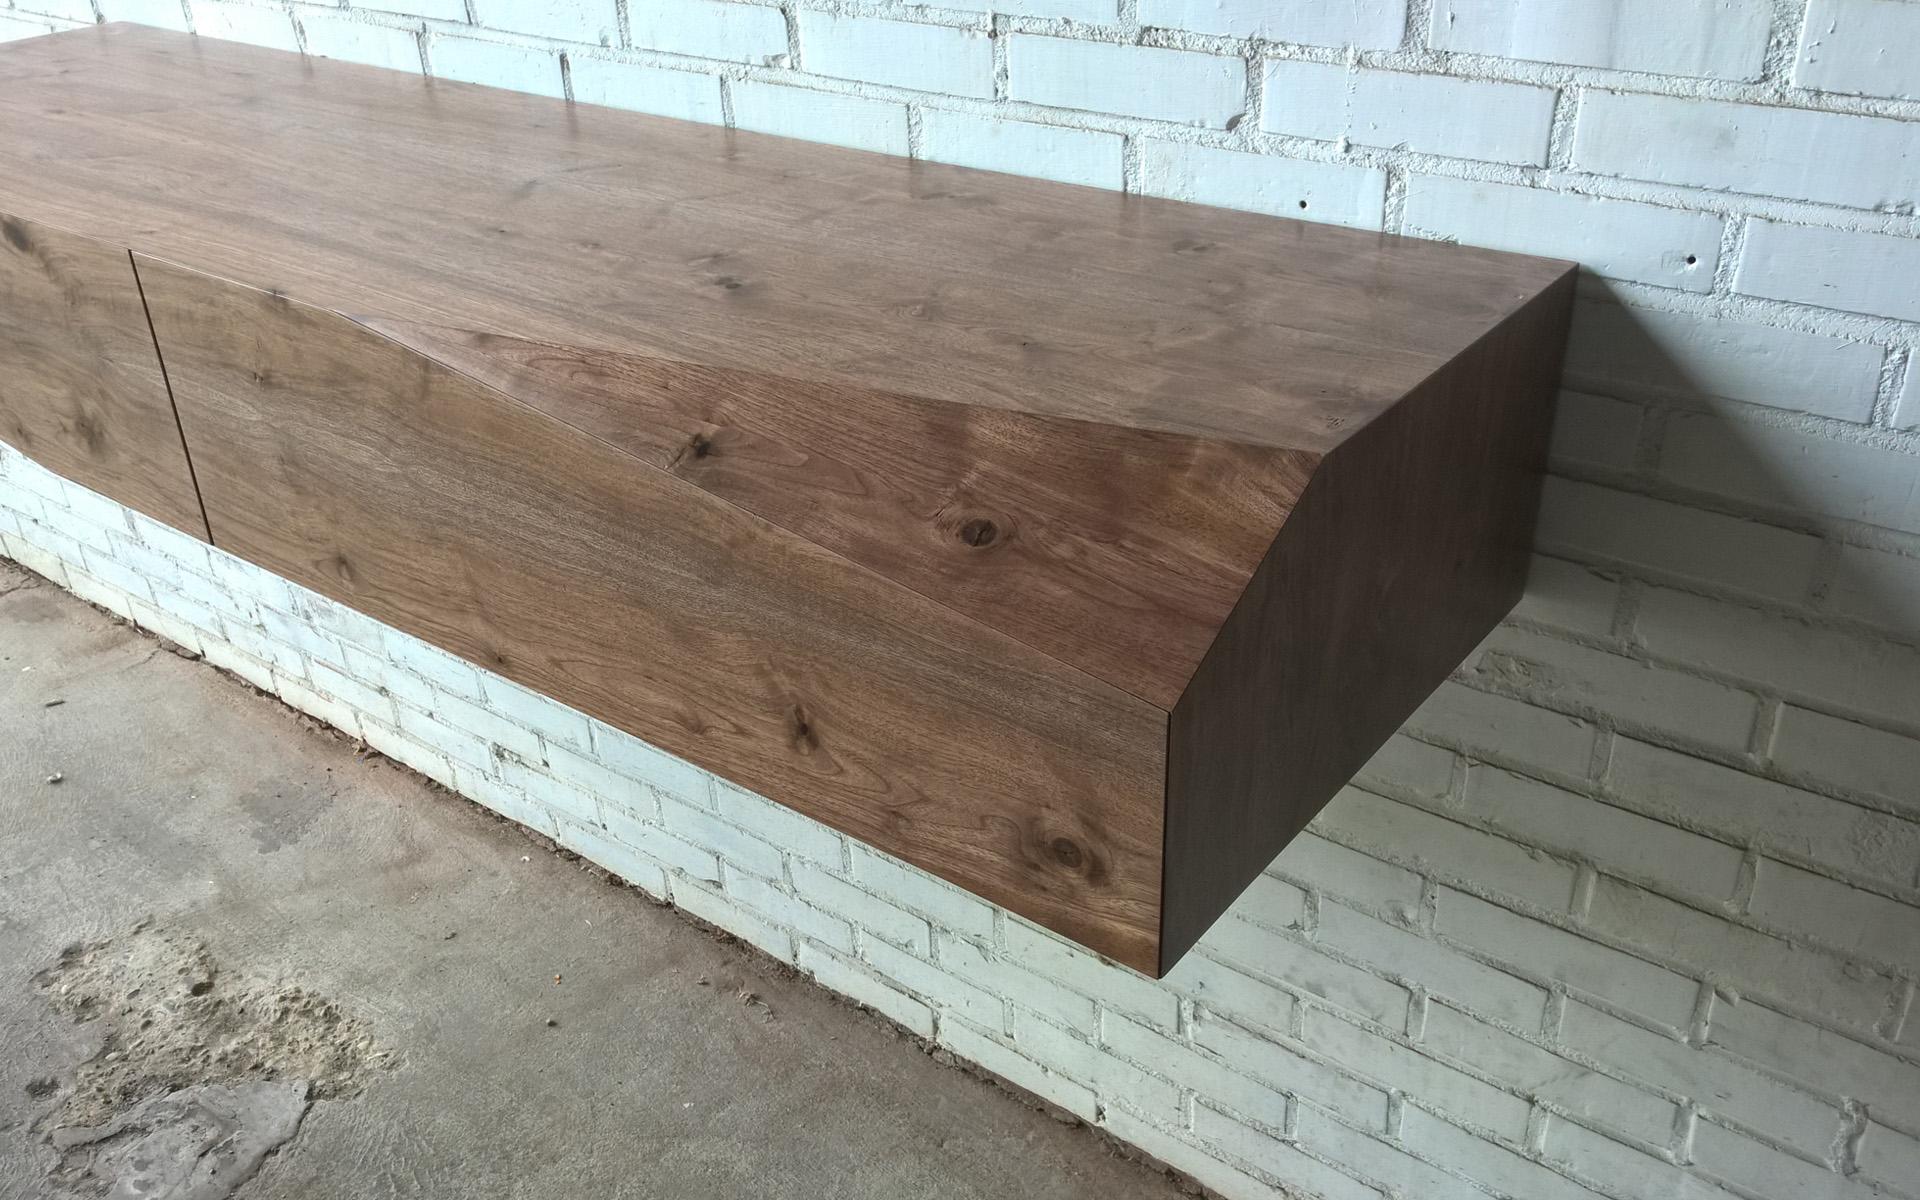 slaapkamer meubels eindhoven ~ lactate for ., Deco ideeën